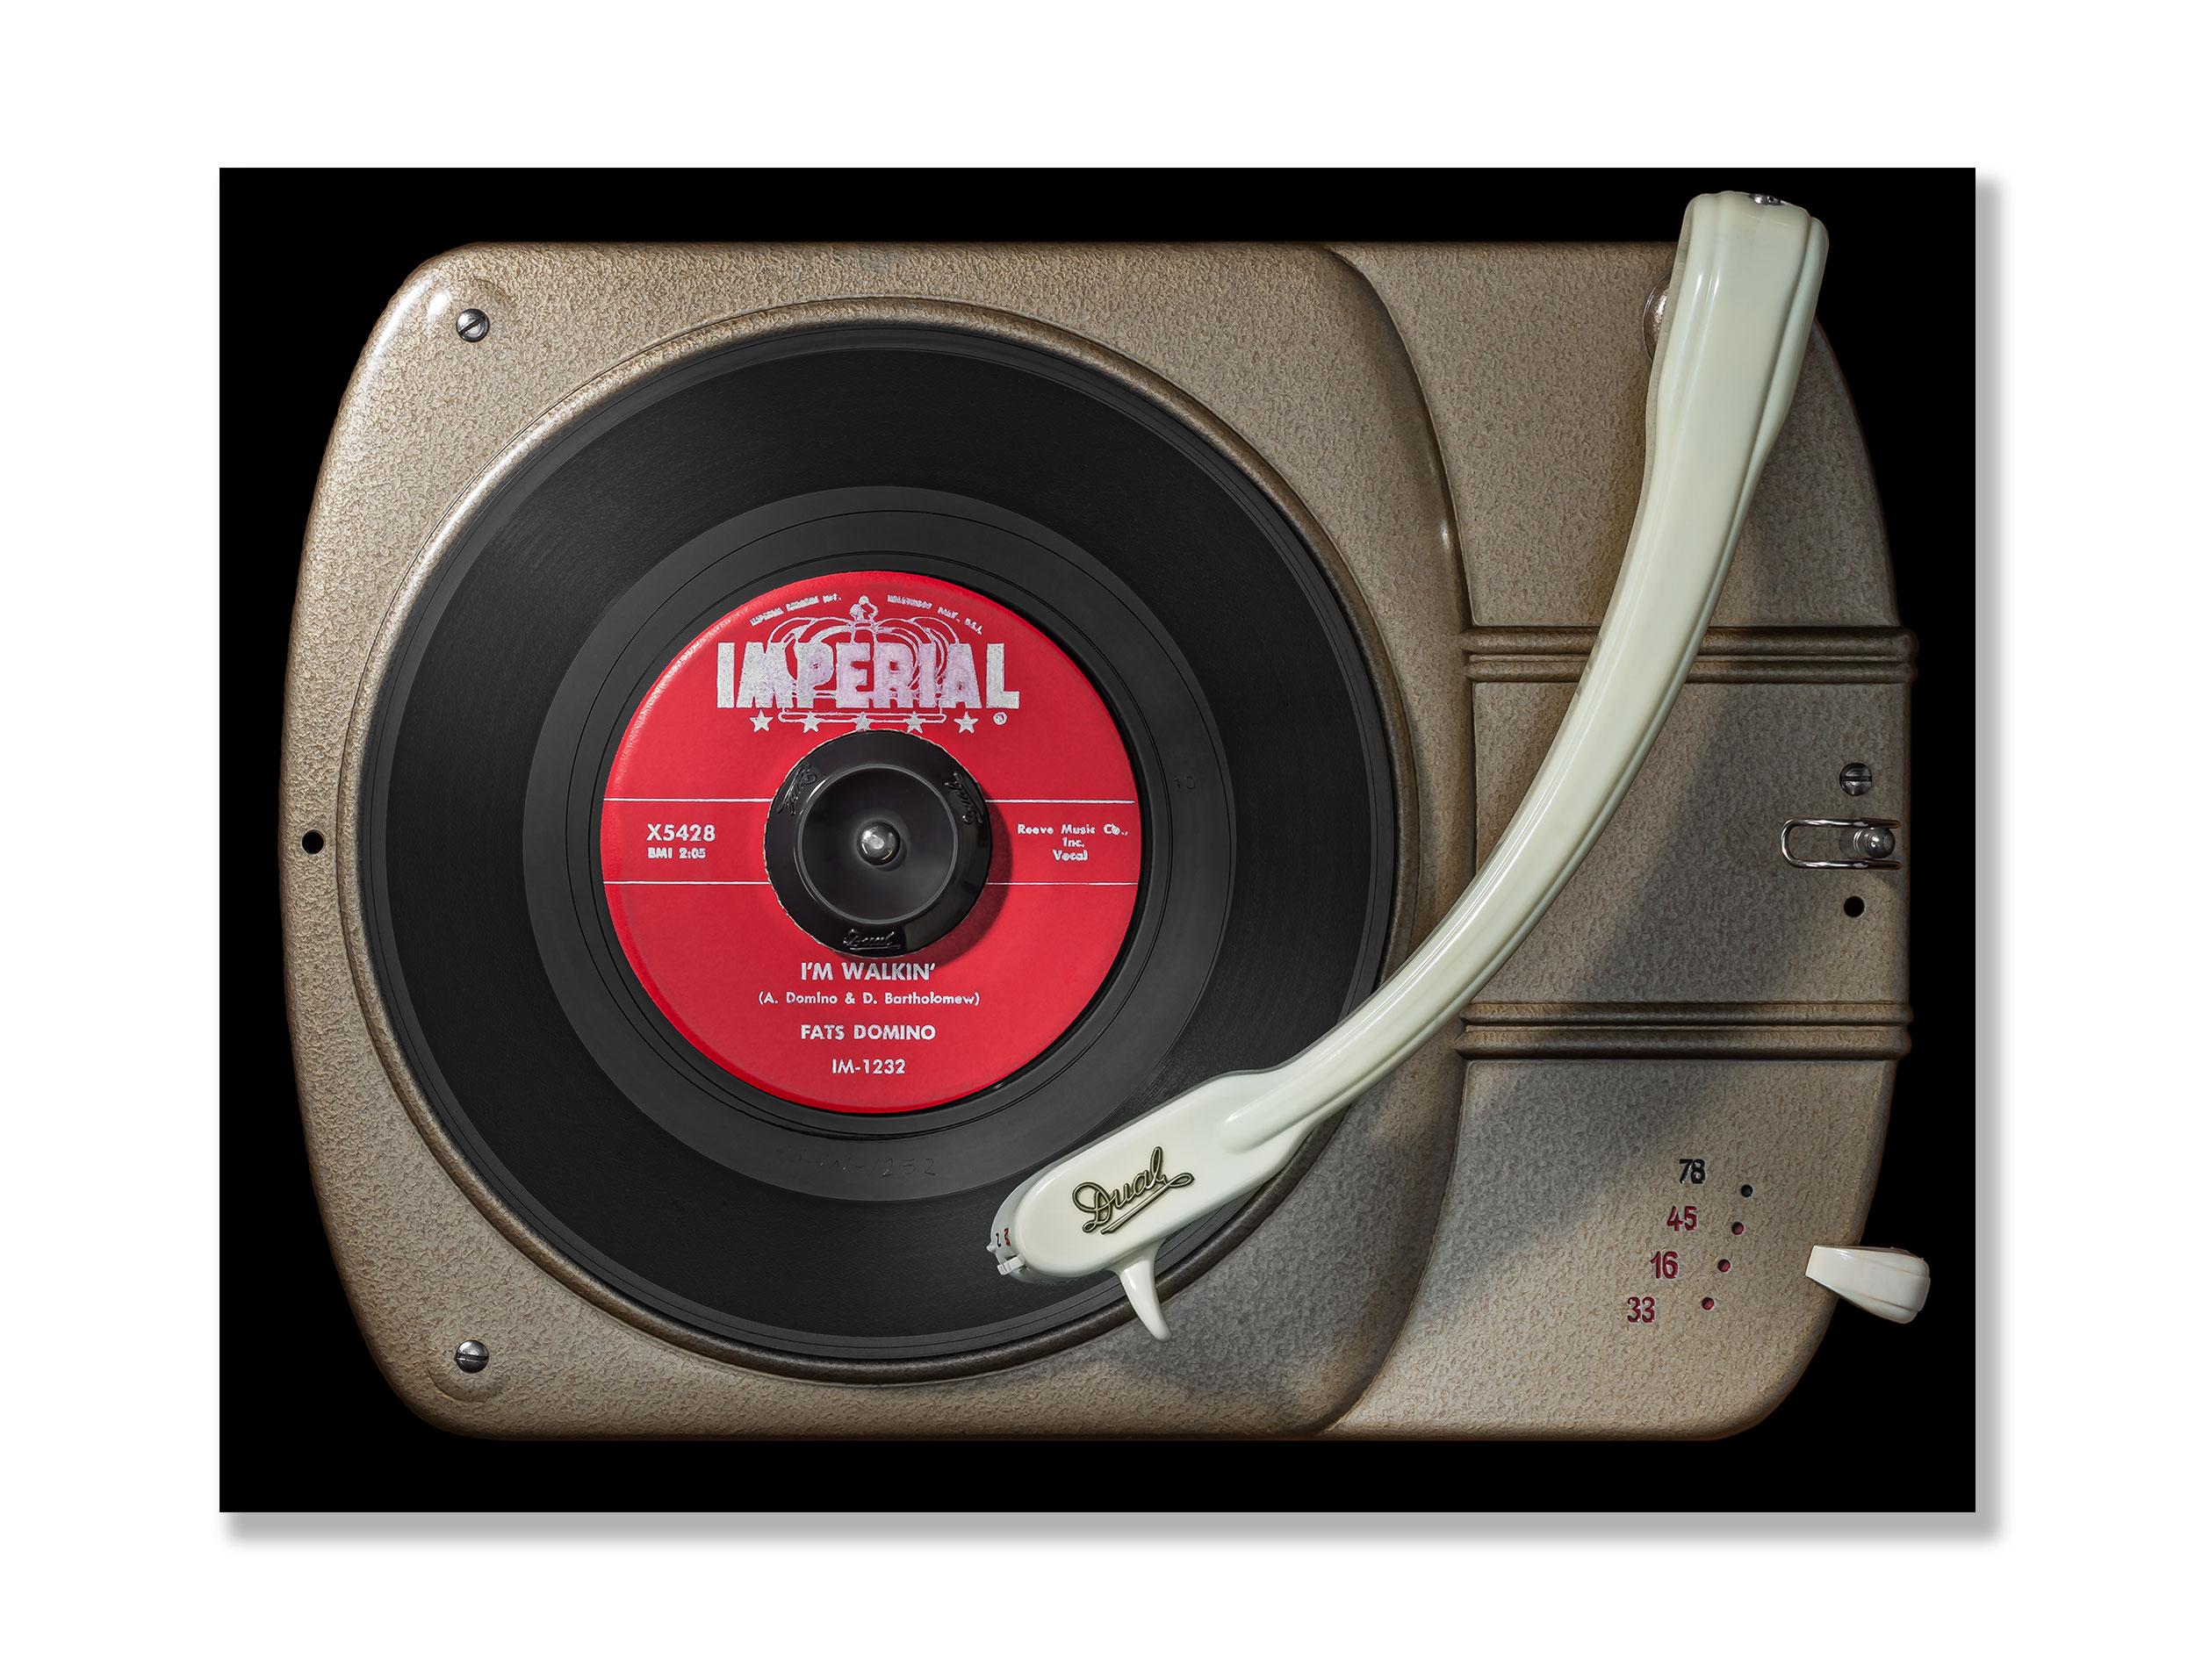 Vinylography No. 18 Fats Domino I'm walkin' on Dual